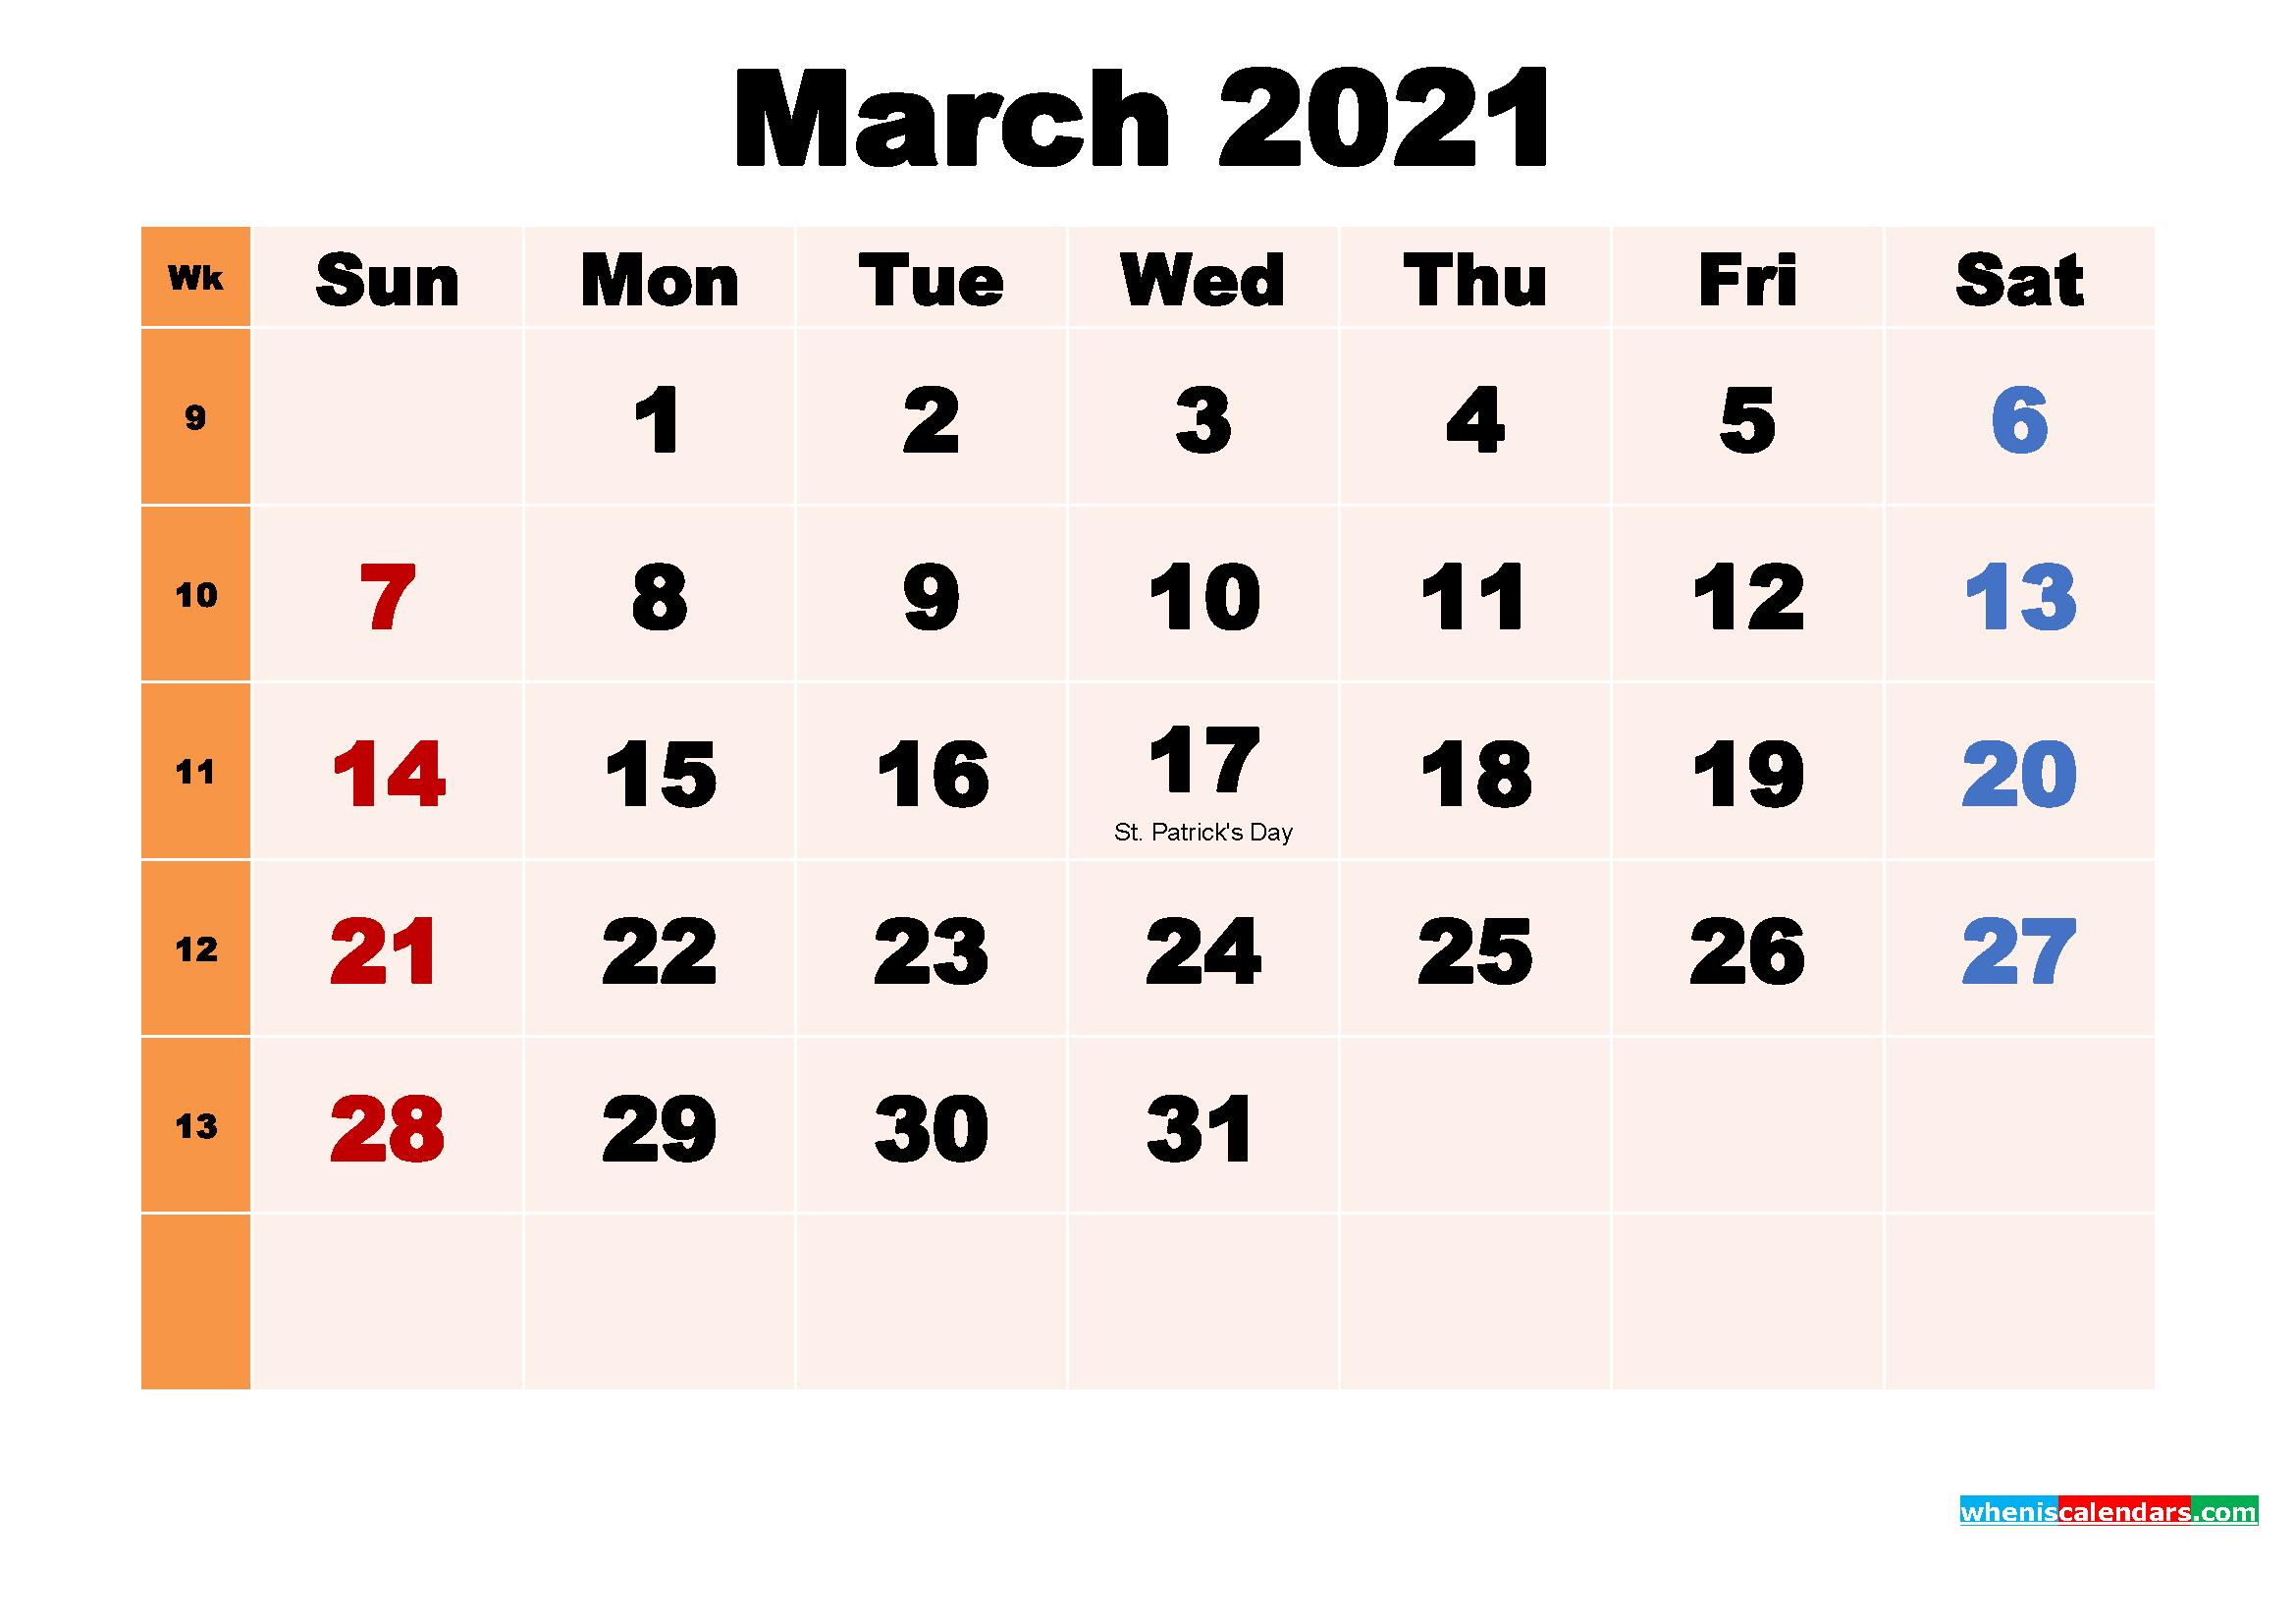 March 2021 Calendar Wallpaper Download